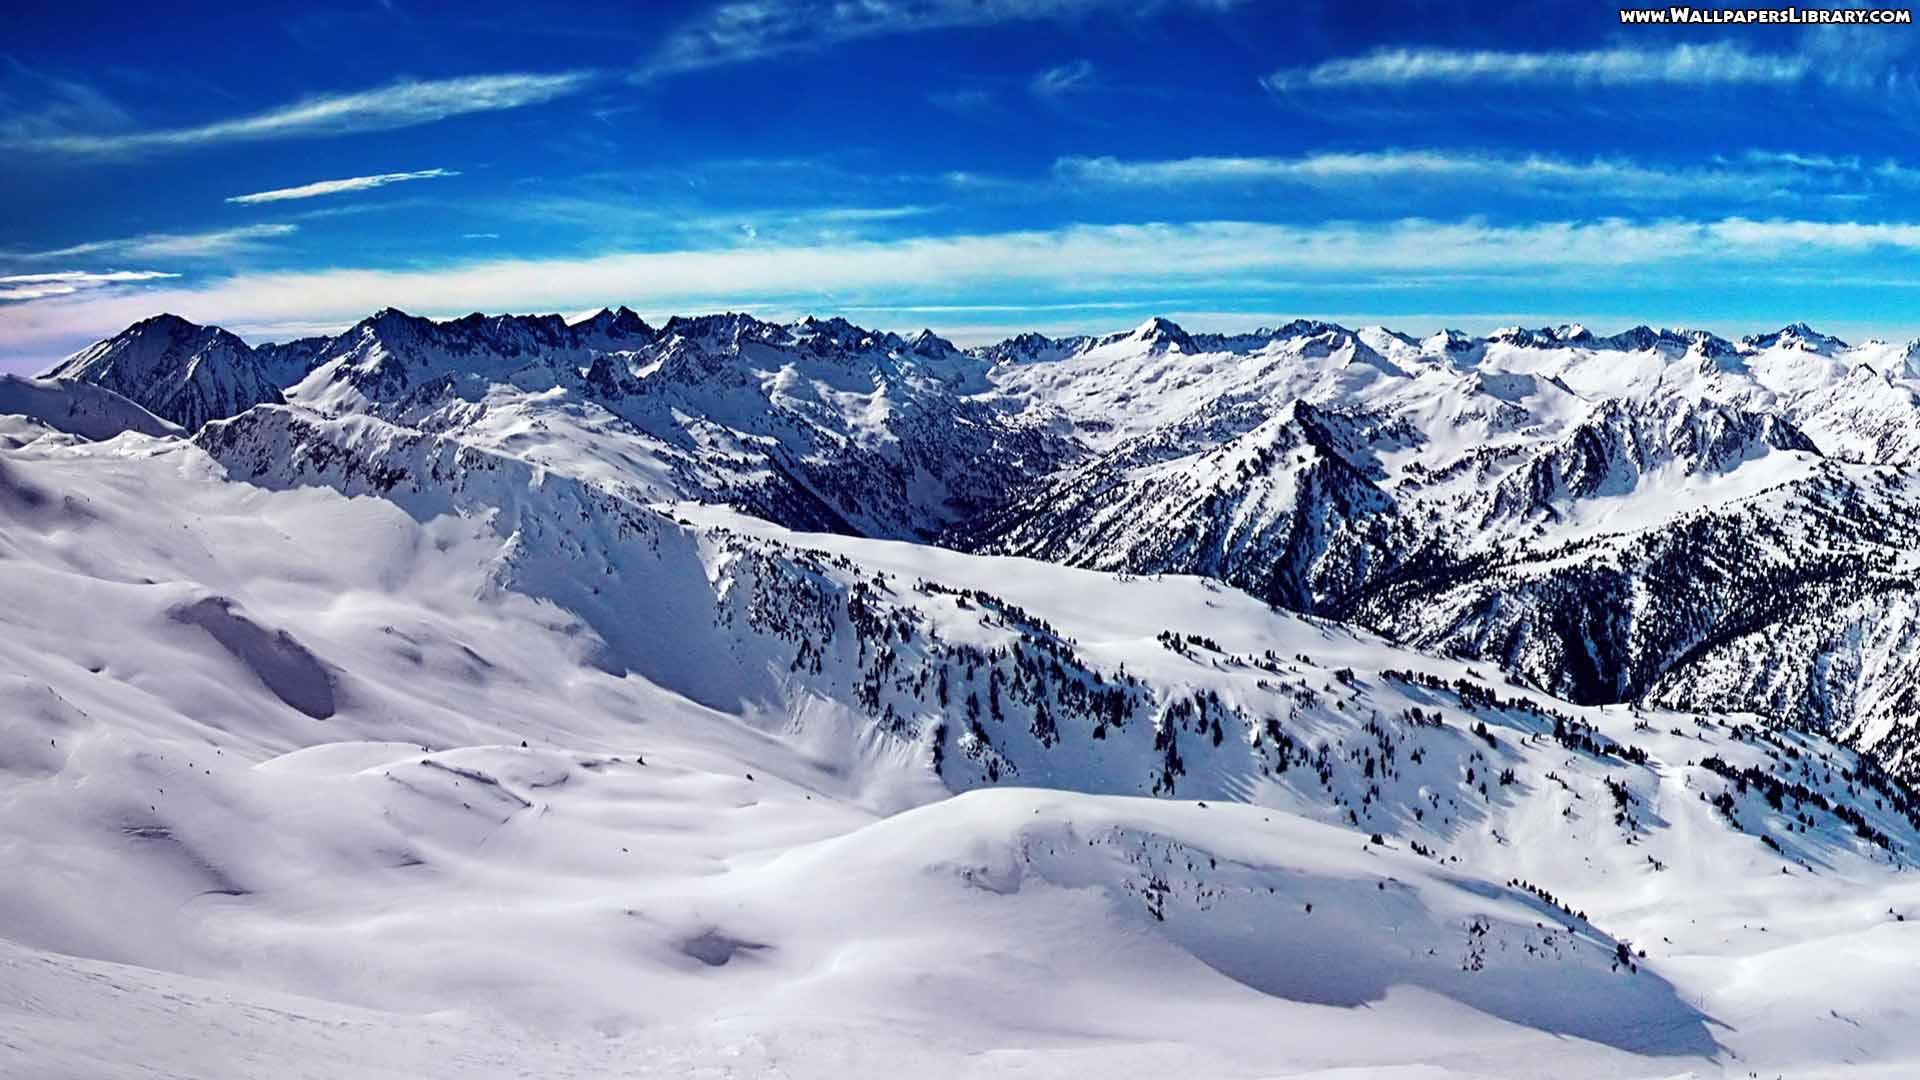 Best Wallpaper Mountain Windows 10 - Windows-10-Wallpaper-Snow-Mountain  Best Photo Reference_234124.jpg